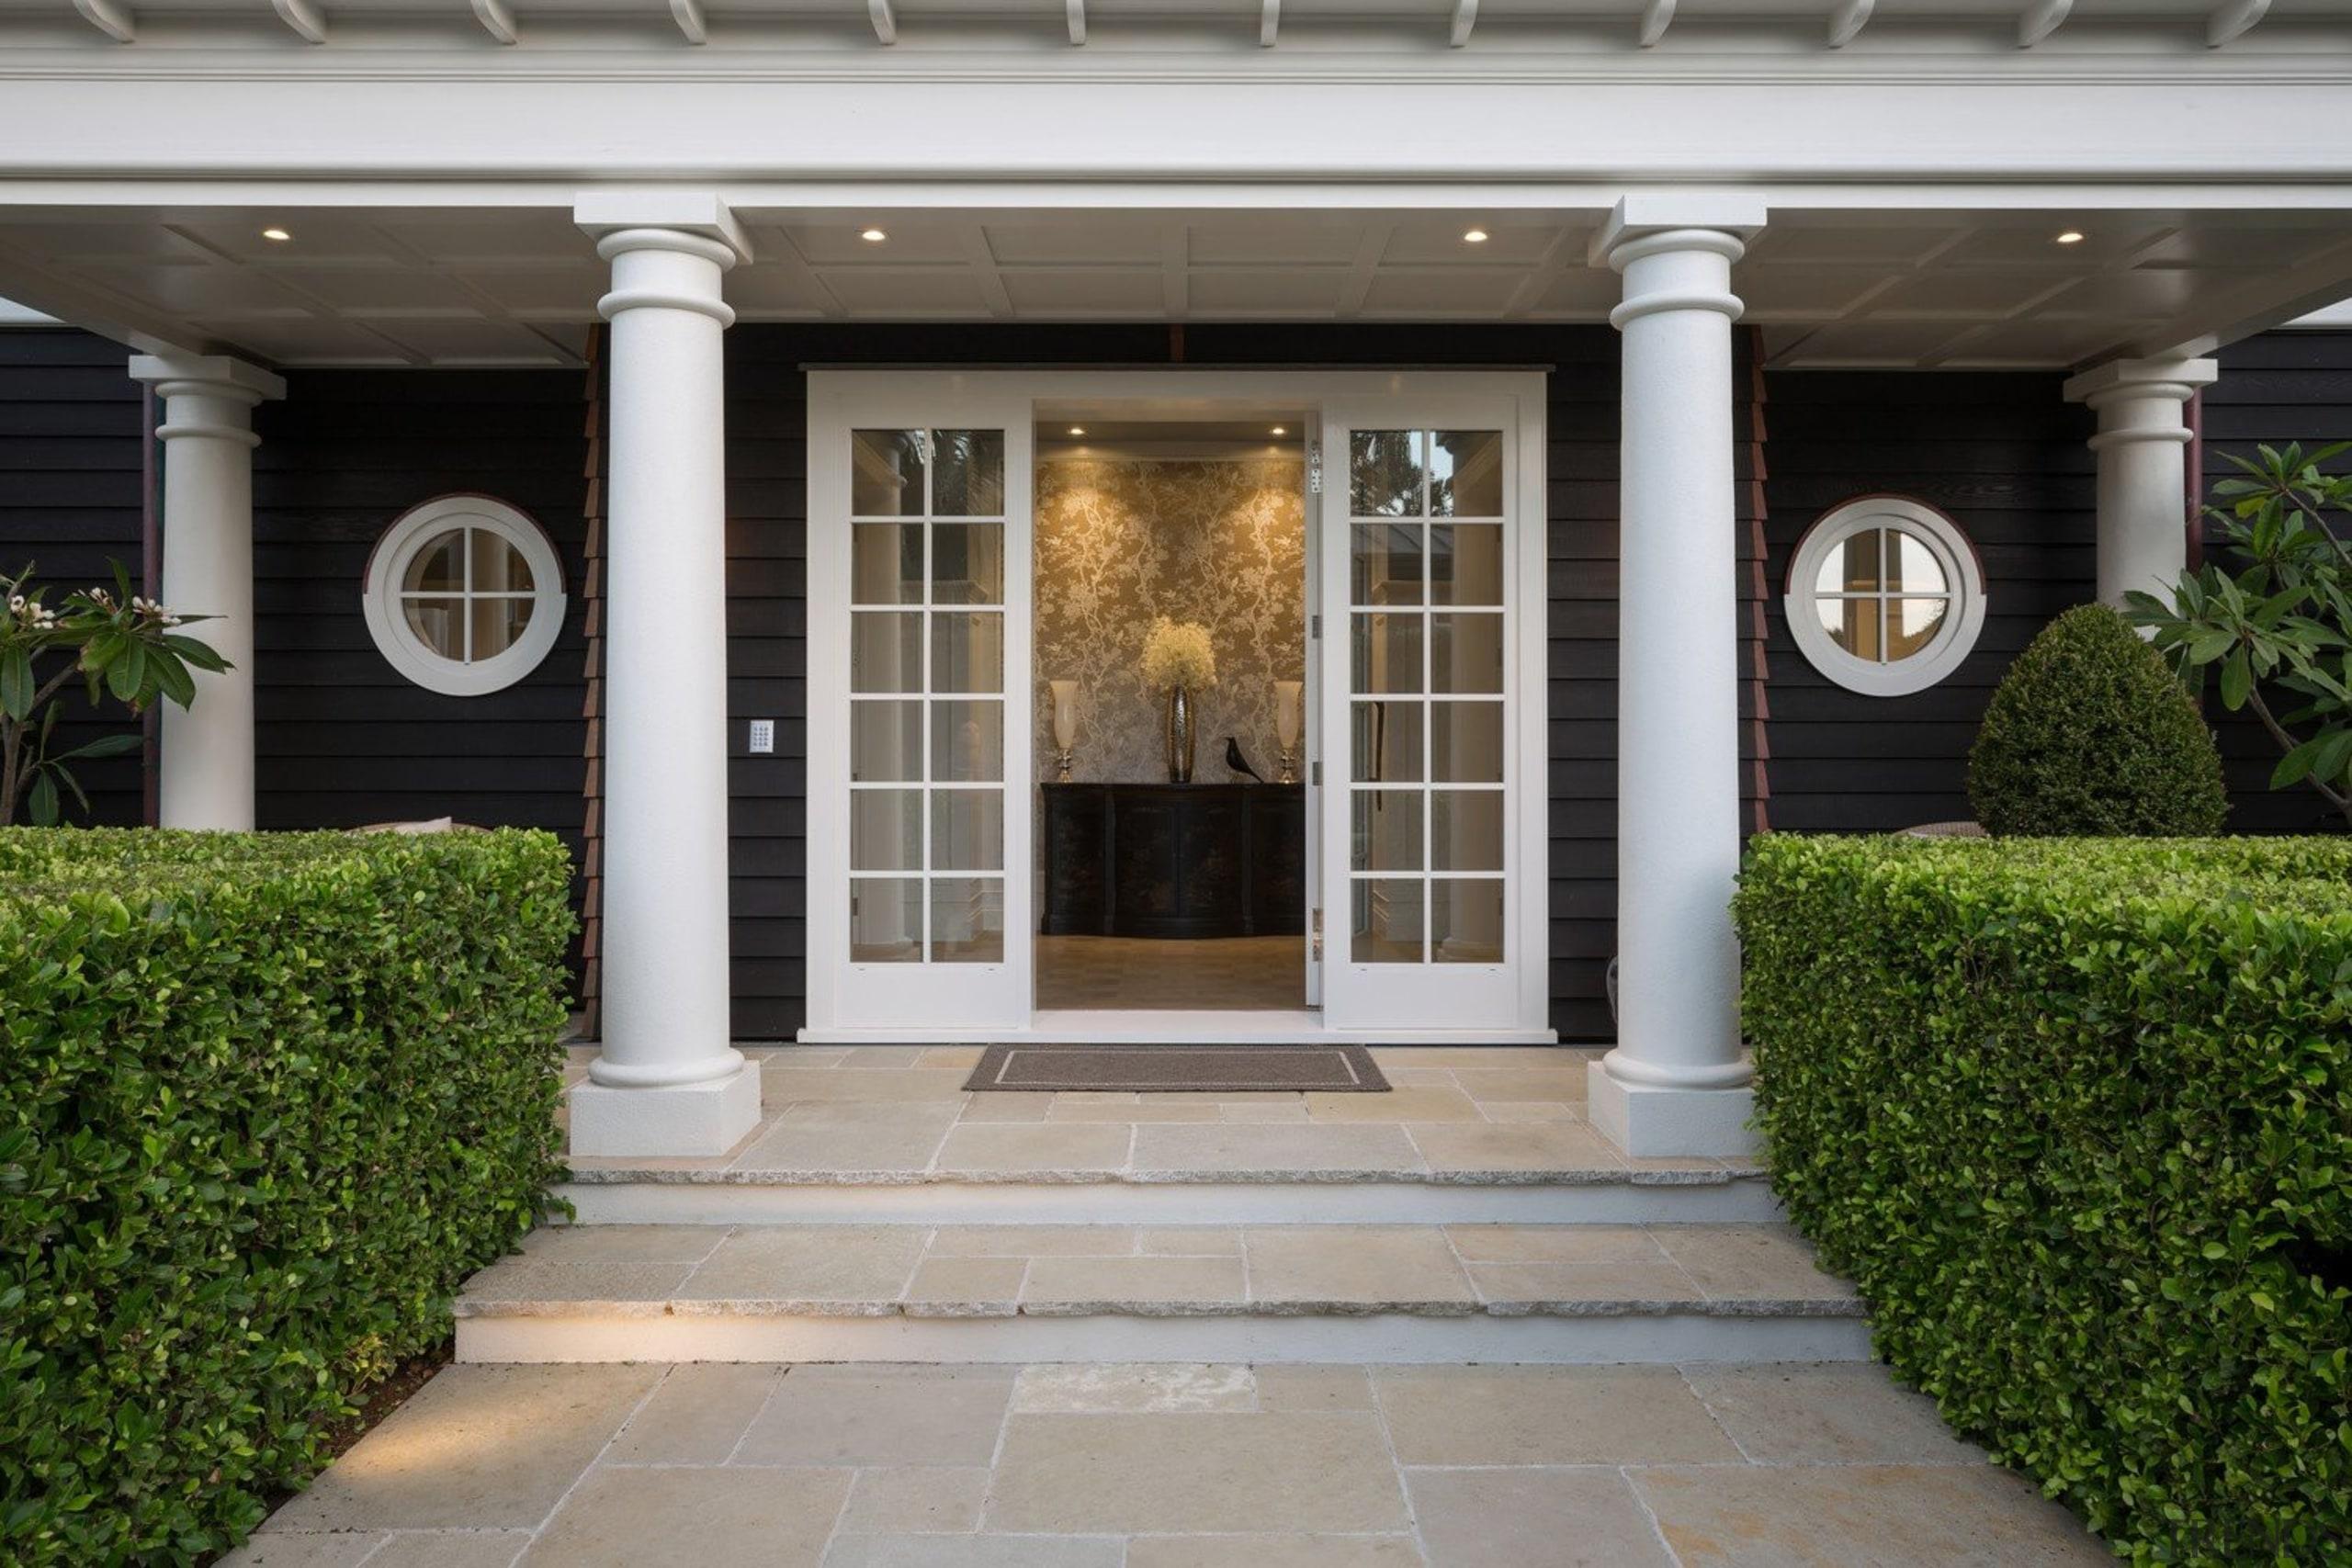 Entrance - courtyard | door | estate | courtyard, door, estate, facade, home, house, outdoor structure, porch, property, real estate, structure, walkway, window, gray